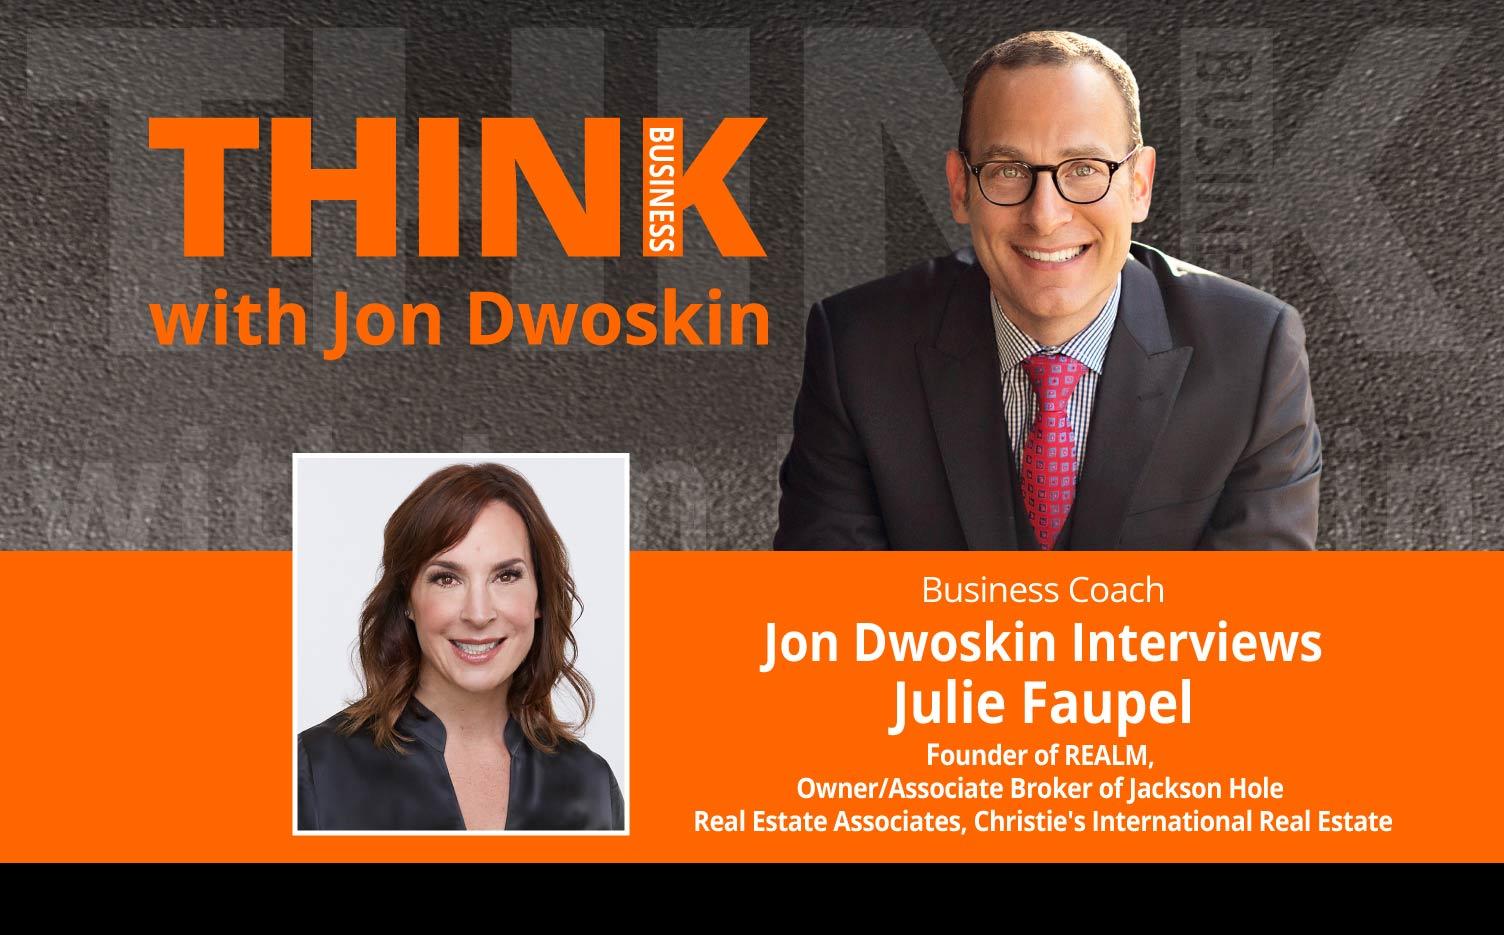 THINK Business Podcast: Jon Dwoskin Interviews Julie Faupel, Founder of REALM, Owner/Associate Broker of Jackson Hole Real Estate Associates, Christie's International Real Estate